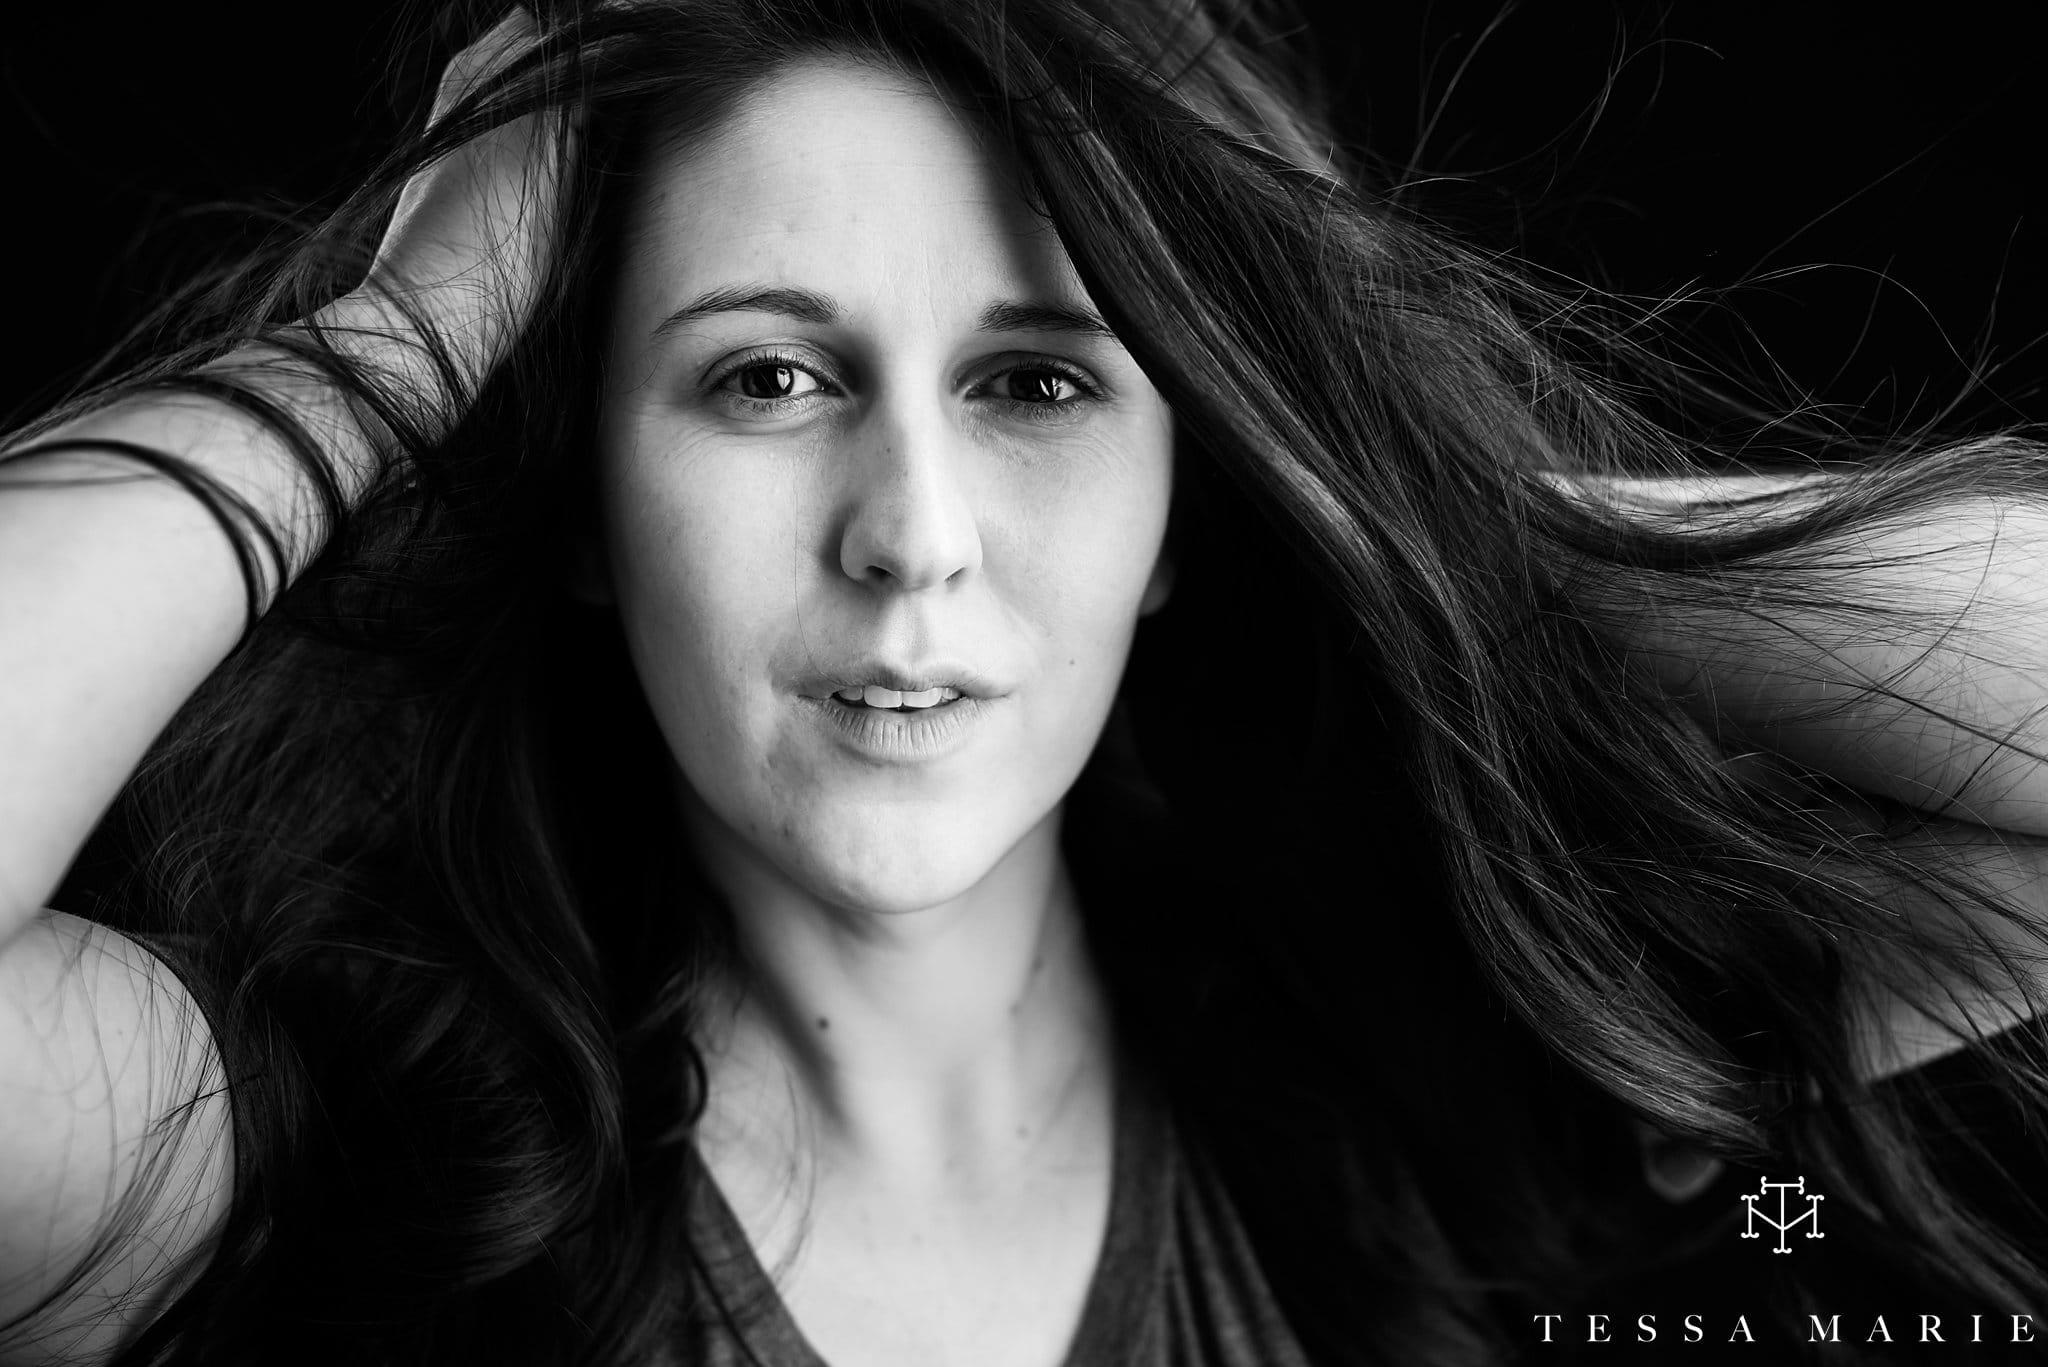 makeup_free_womens_portraits_tessa_marie_studios_no_makeup_empowering_women_0007.jpg